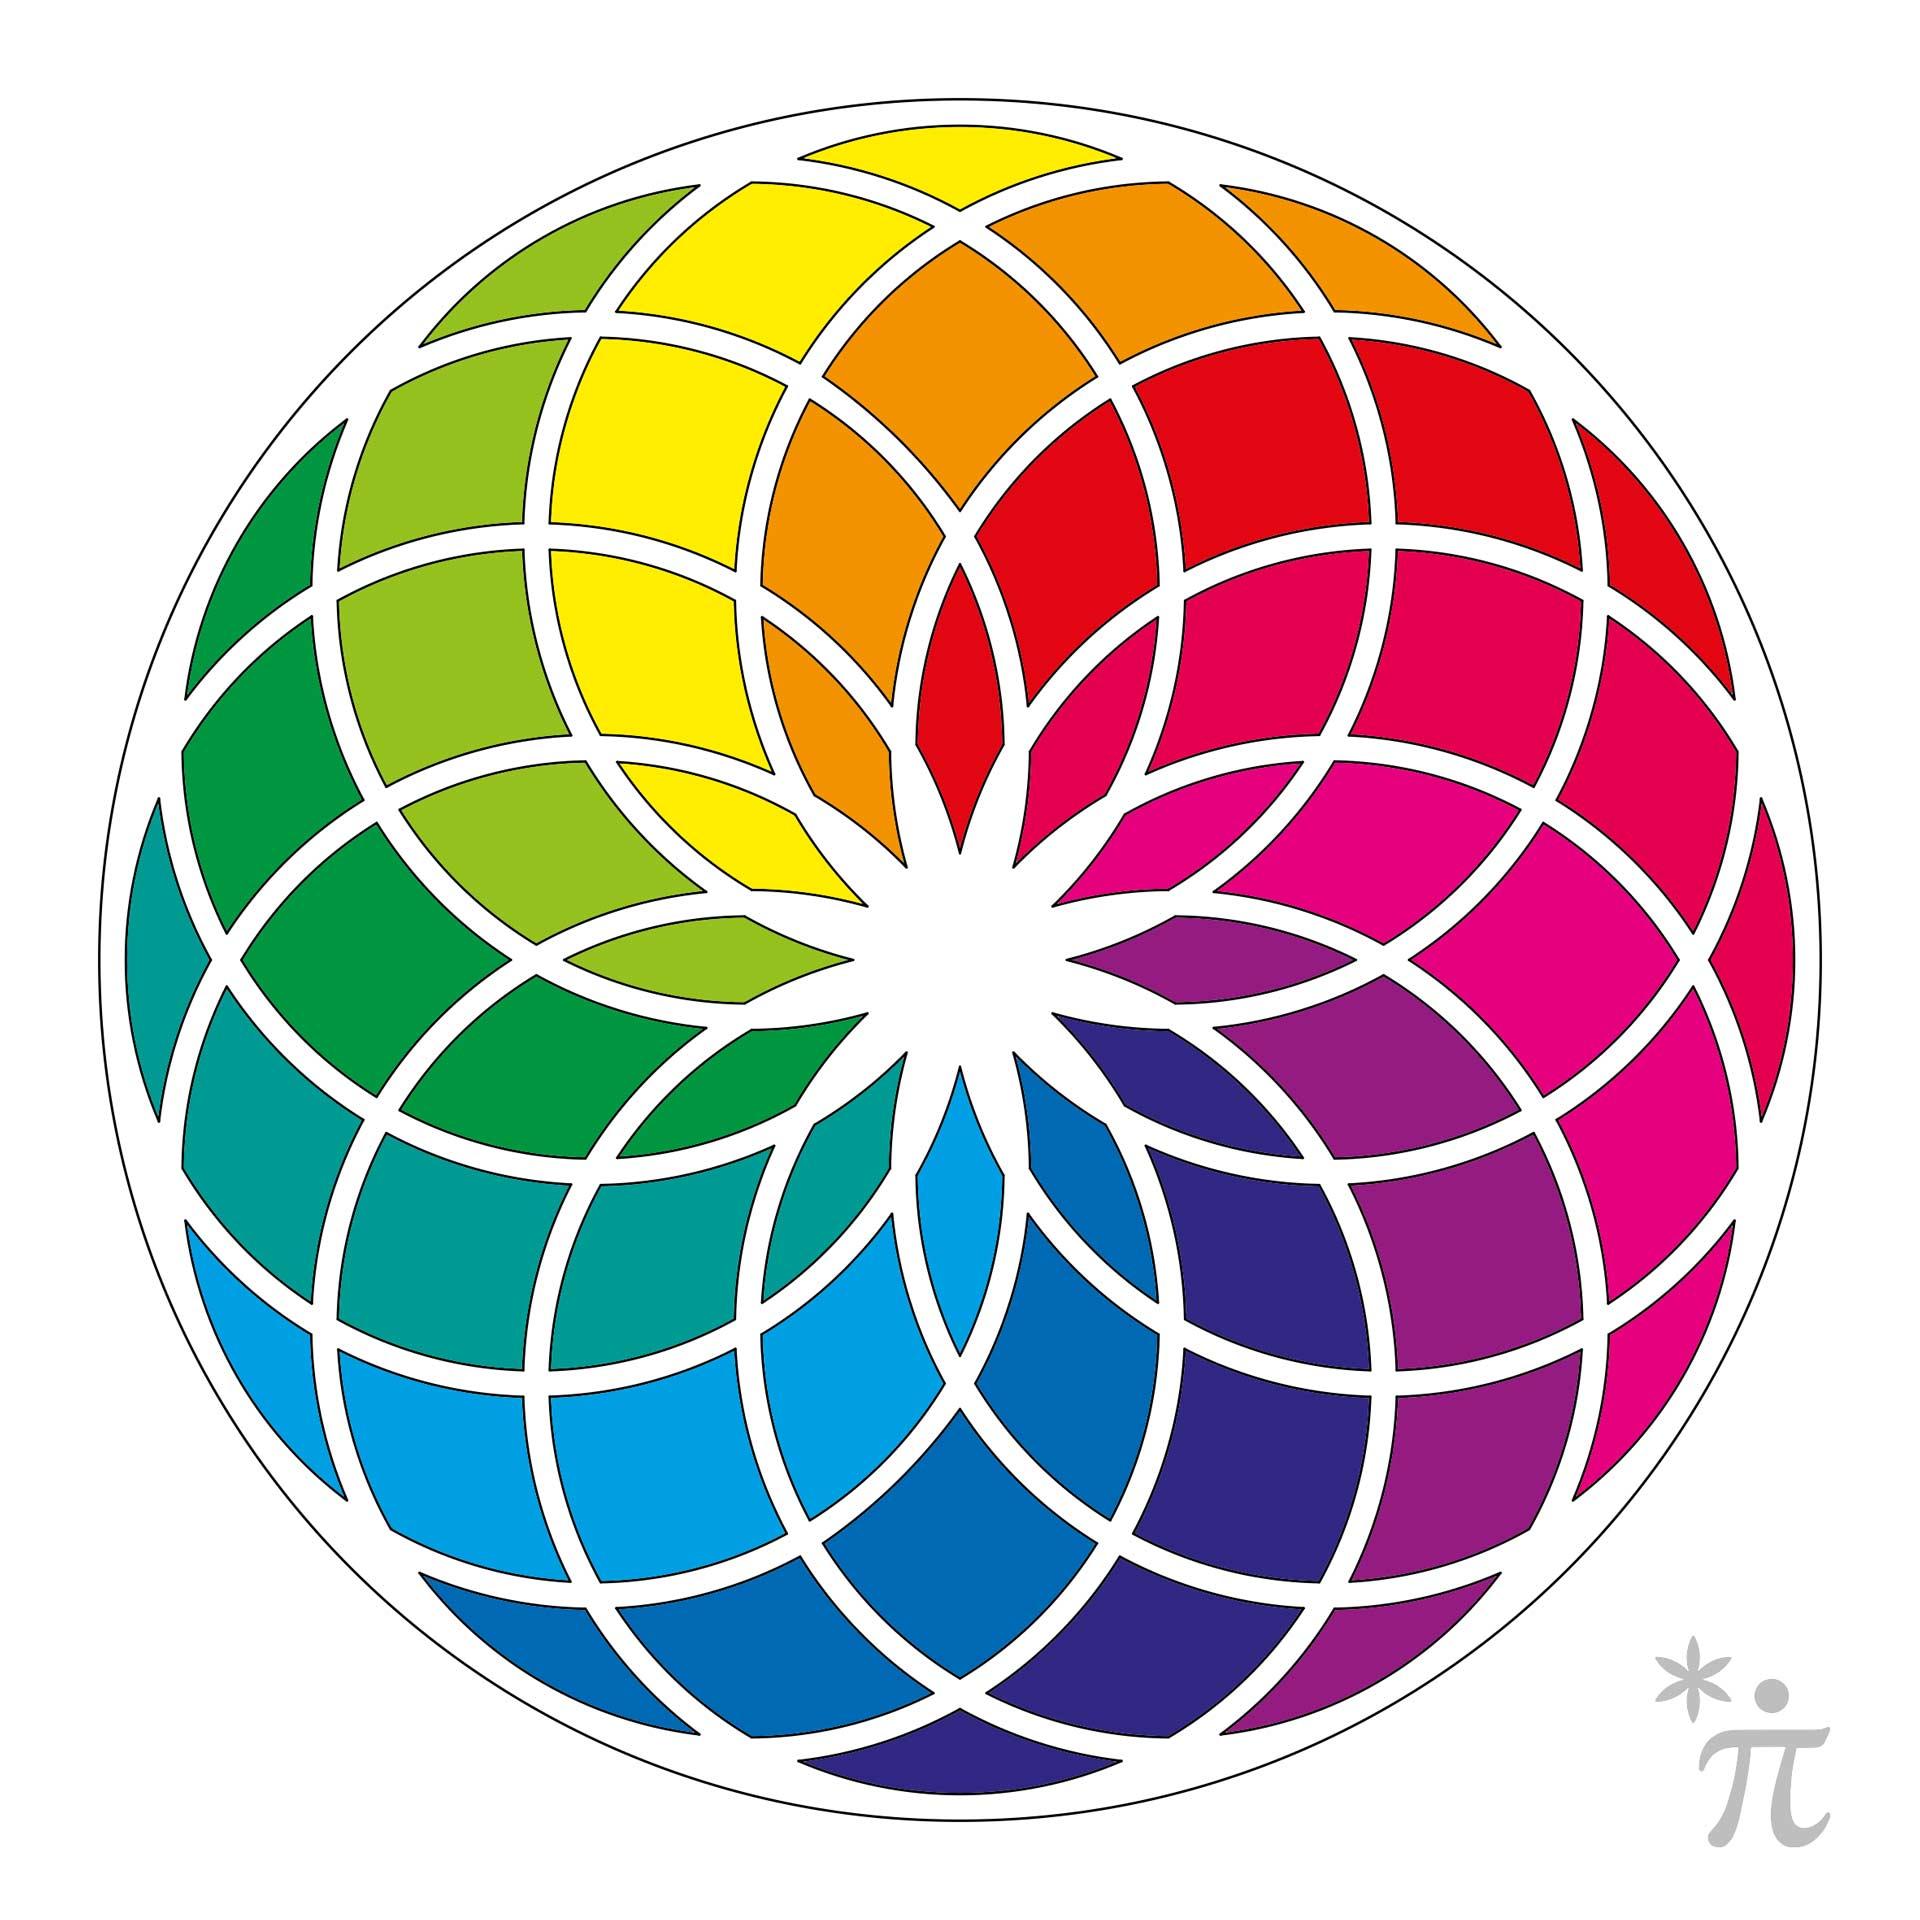 Torus der Lebensblume als Farbenkreis